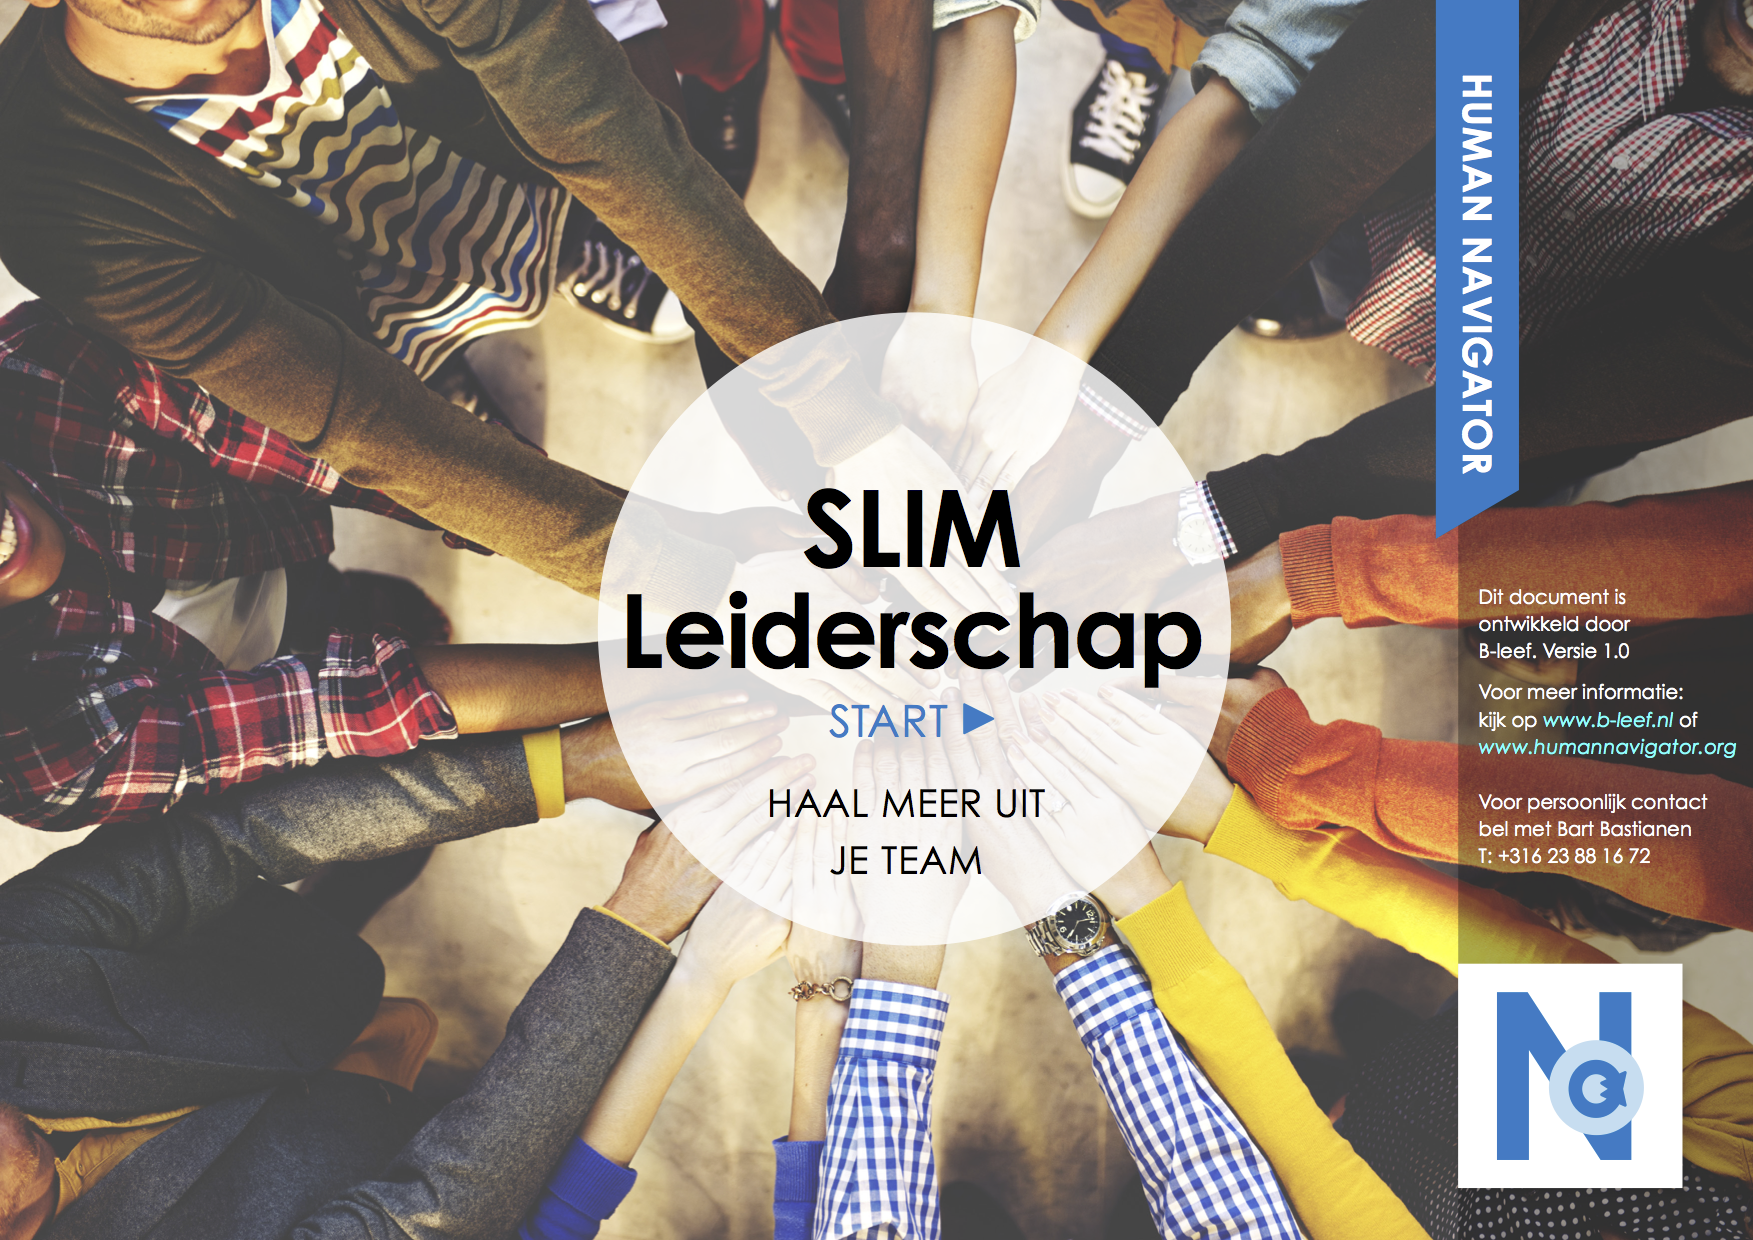 Slim leiderschap e-boek